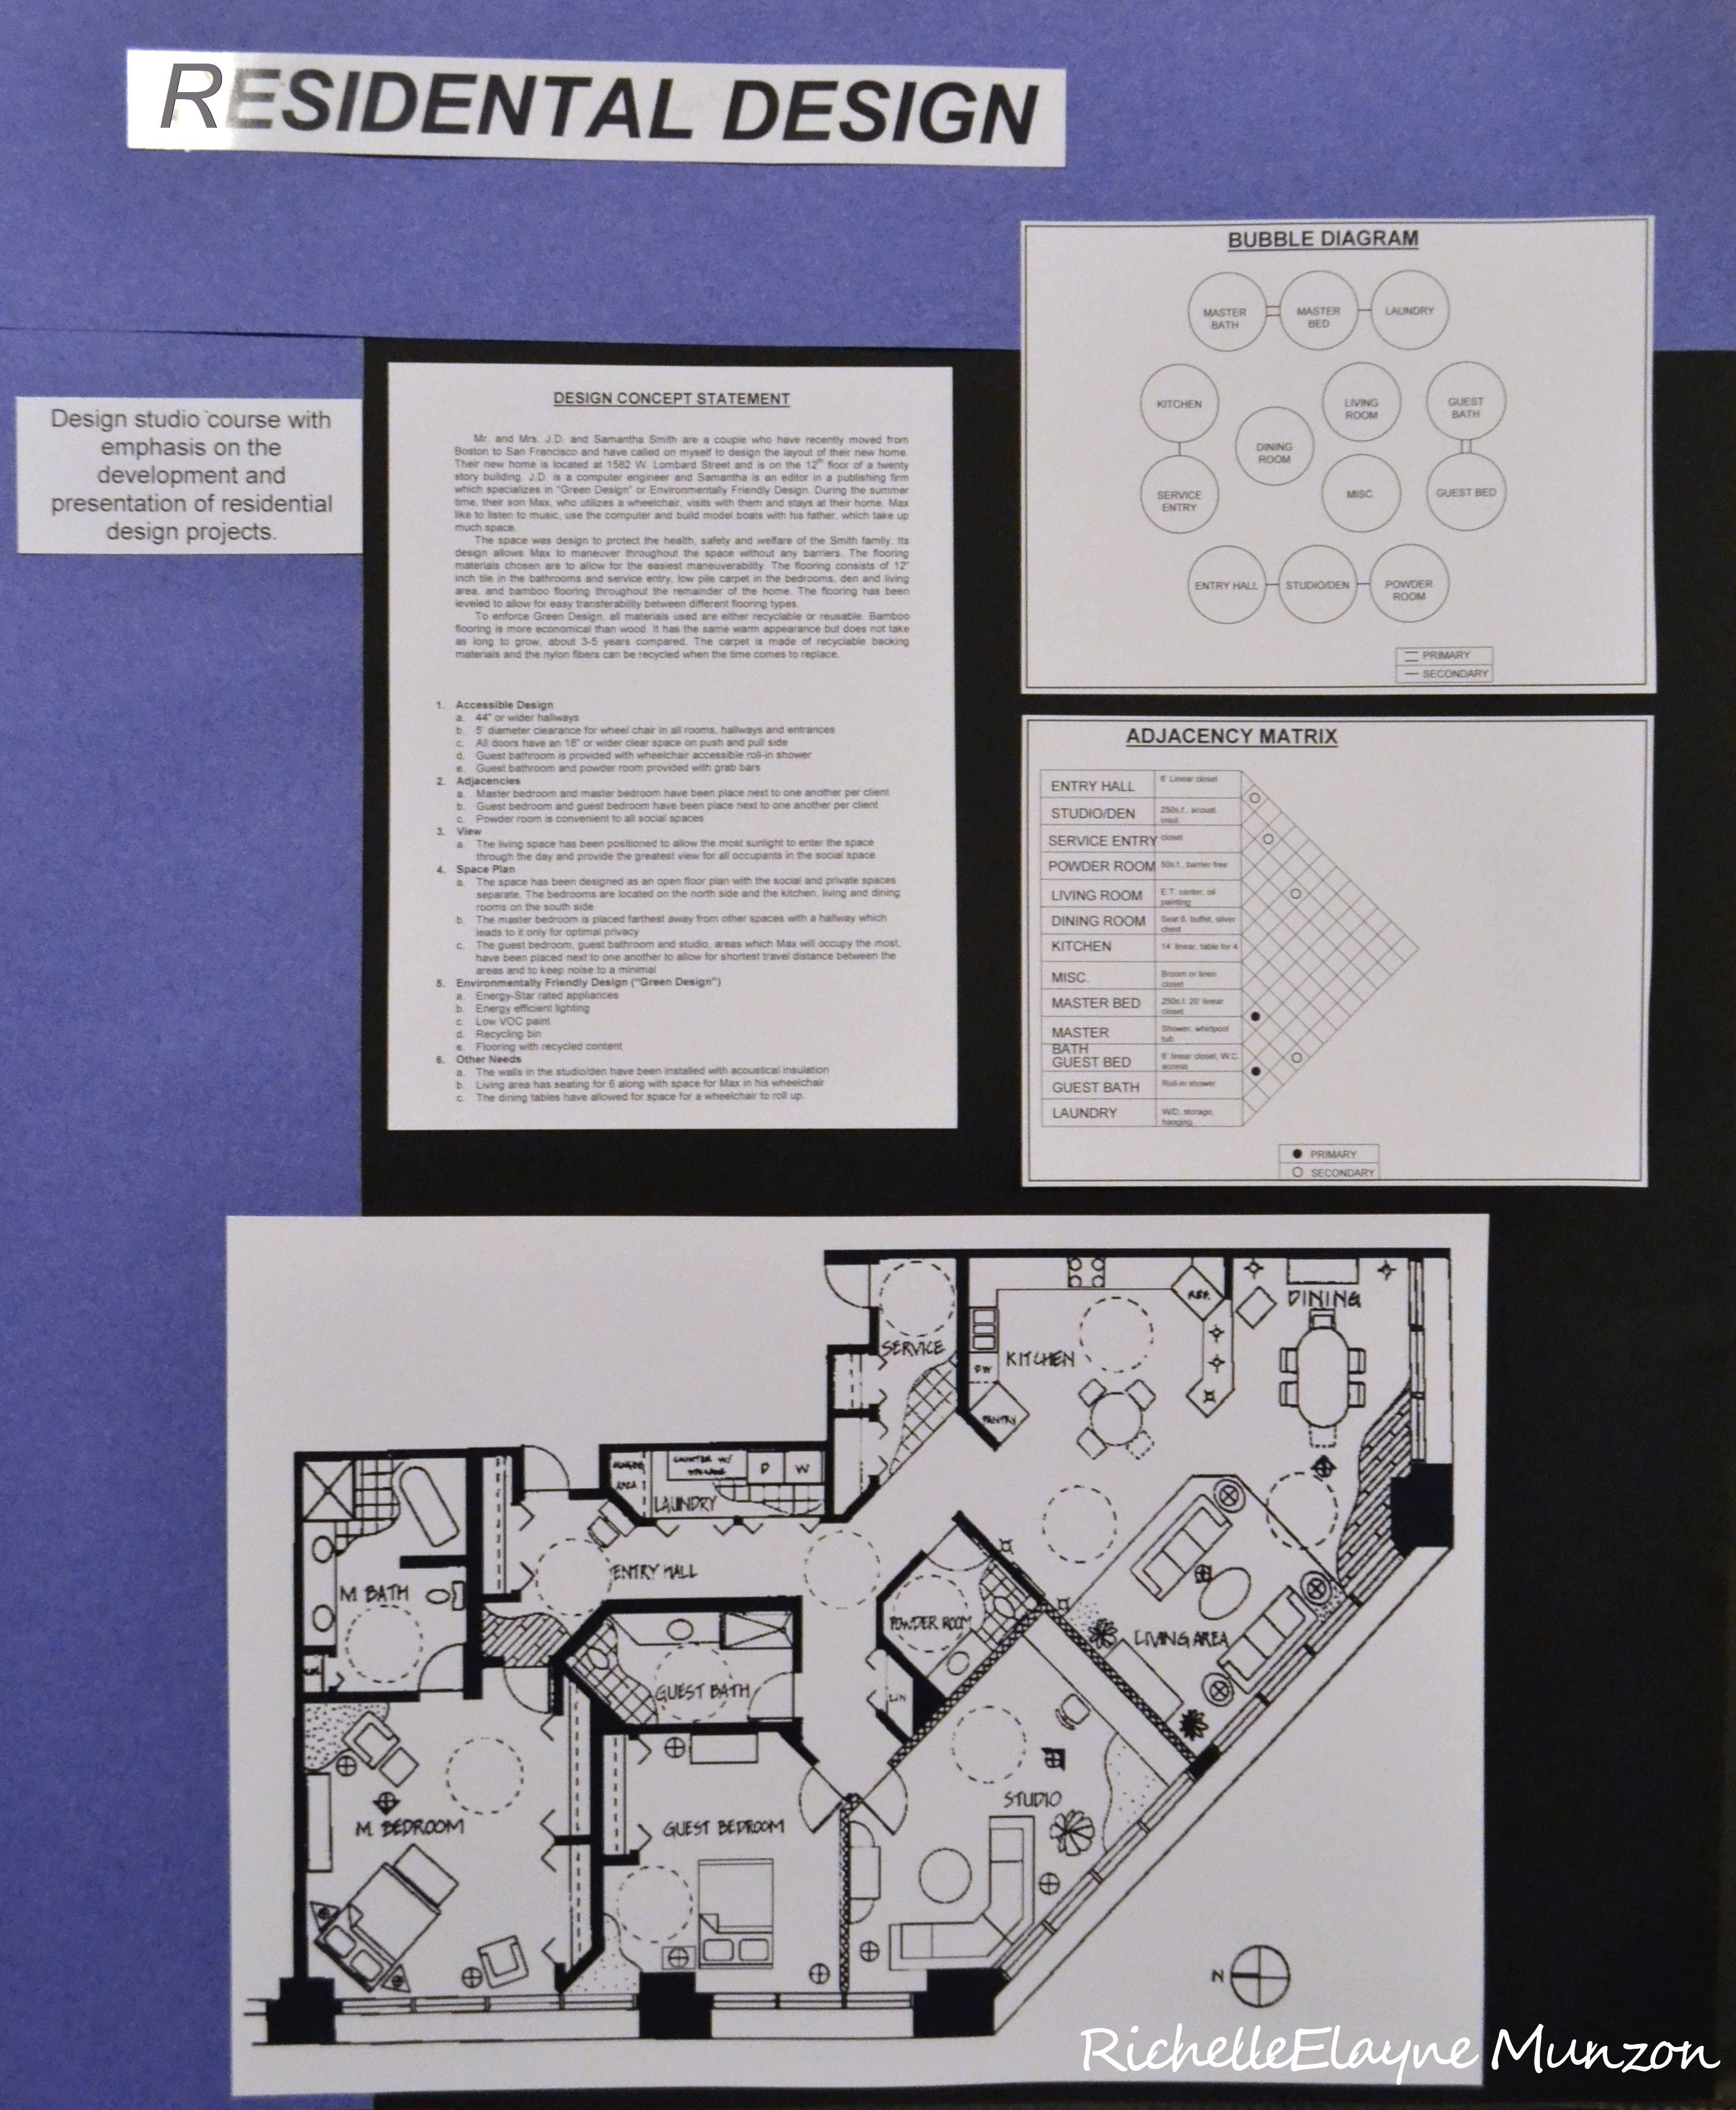 Hand Drafted Floor Plan With Design Concept Statement Bubble Diagram And Adjacency Matrix By Richelle El Interior Design Student Bubble Diagram Concept Design